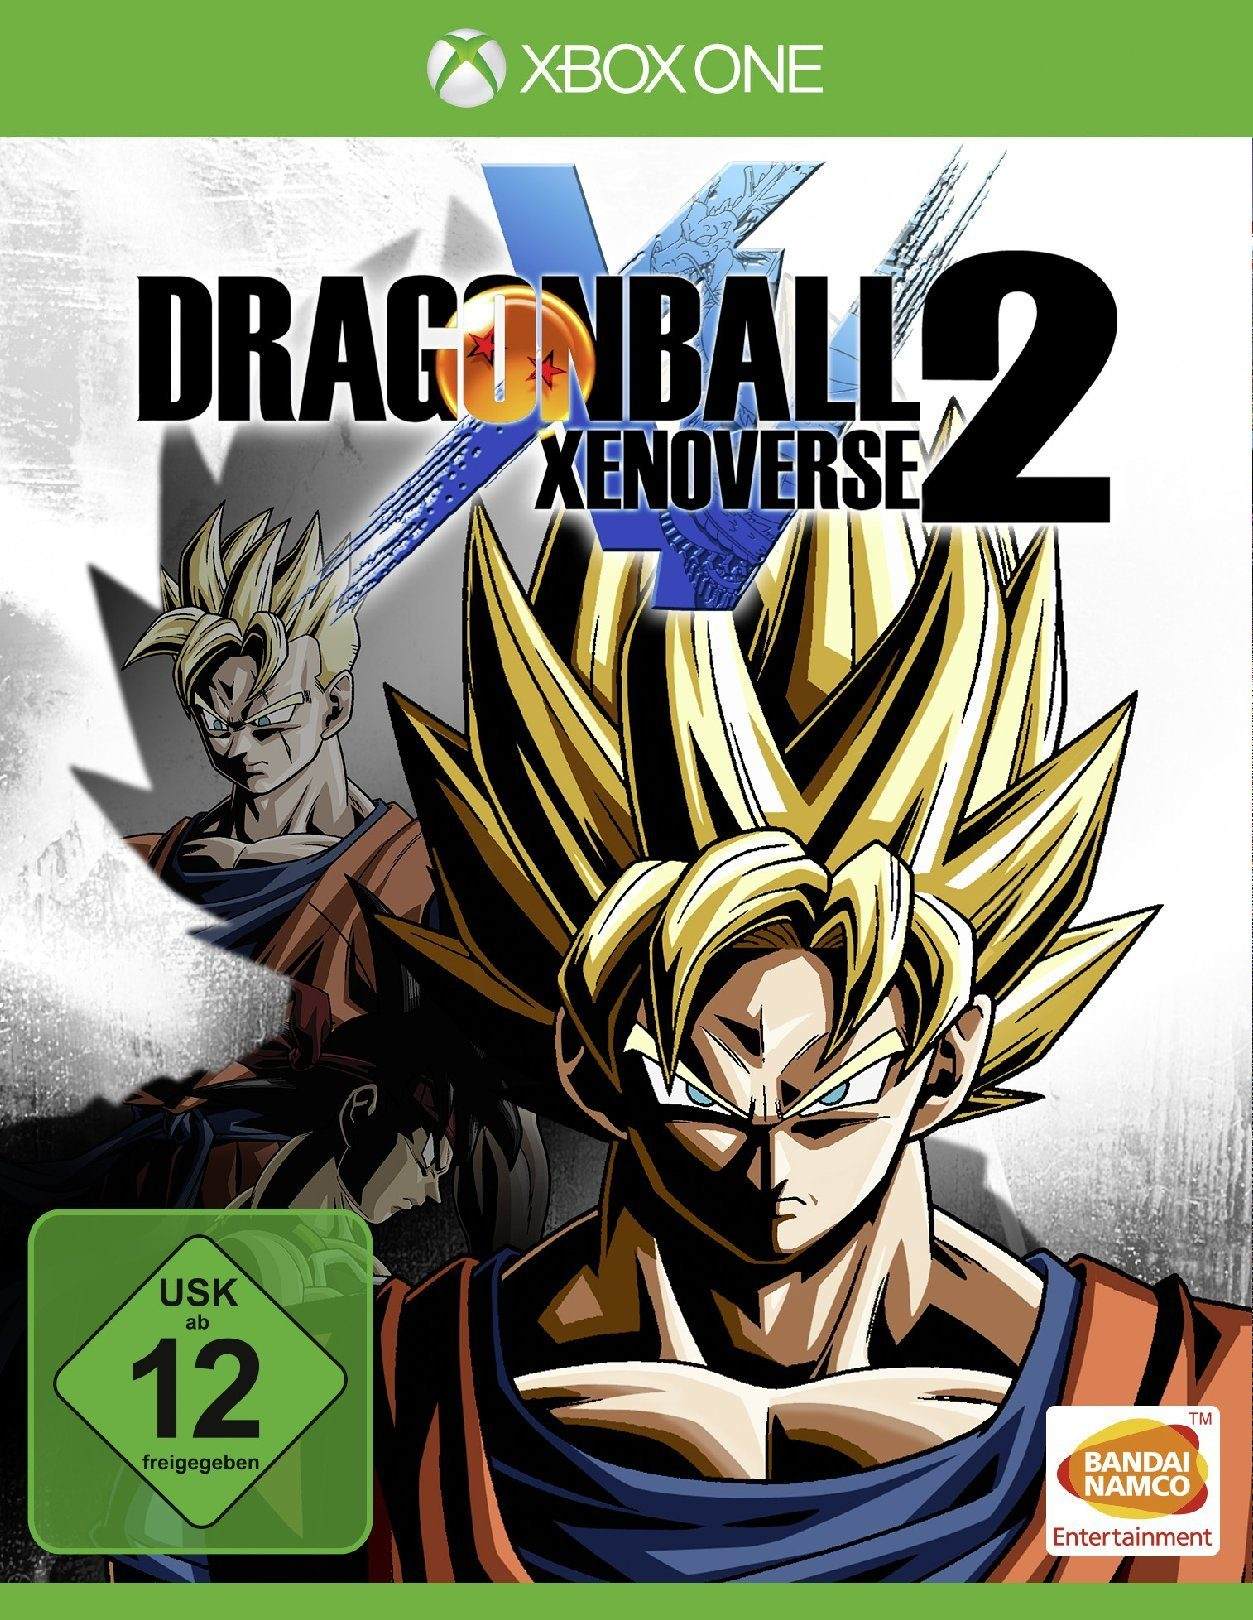 Bandai Namco Dragon Ball Xenoverse 2 »(XBox One)«